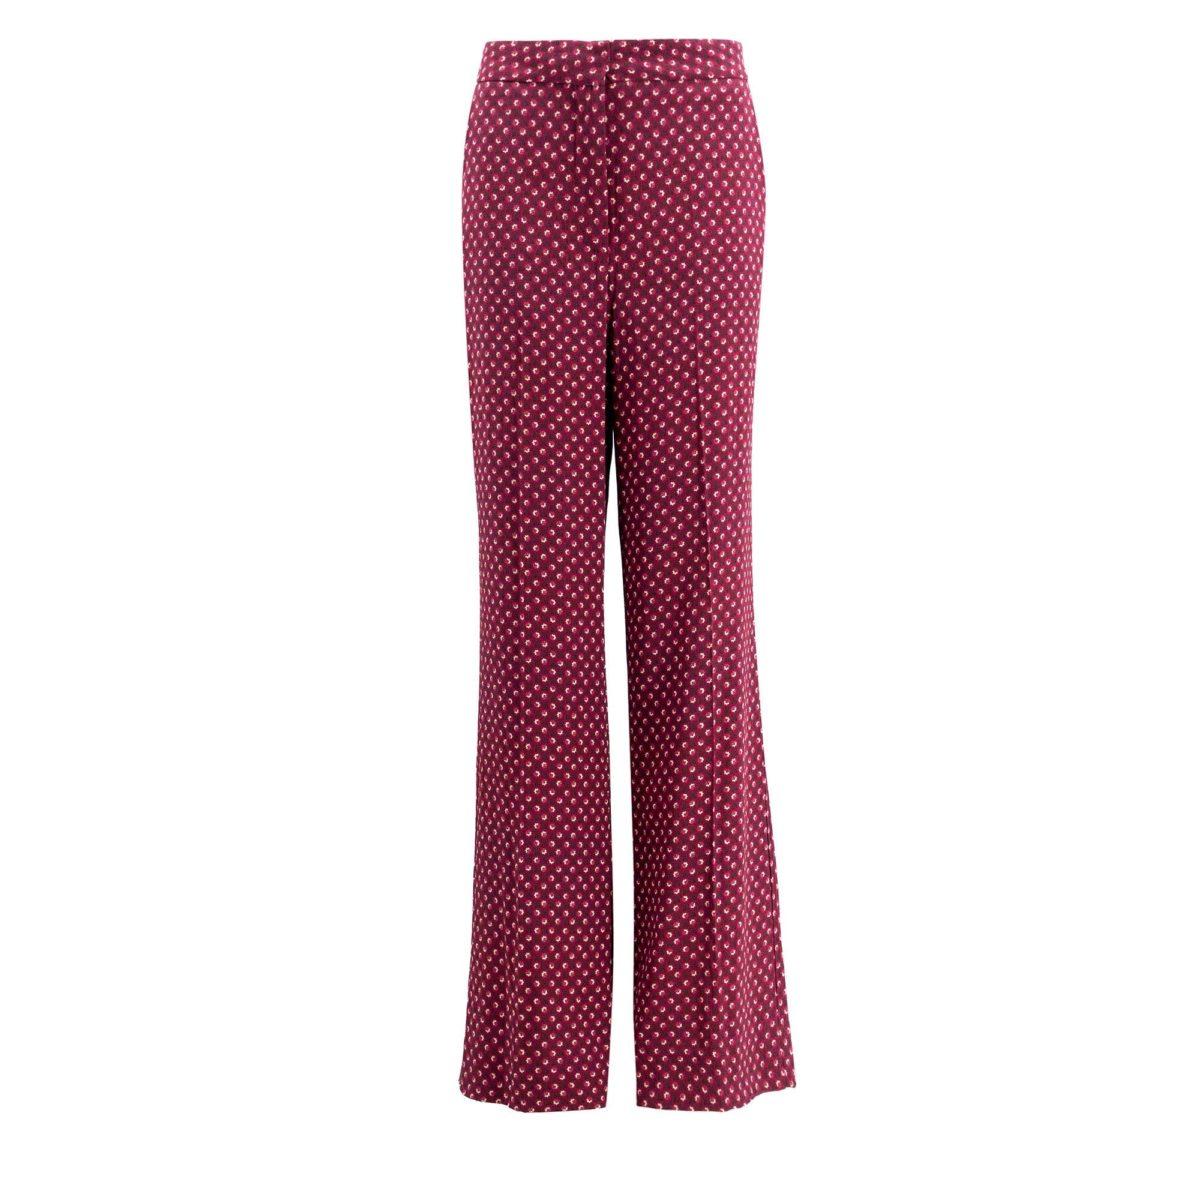 Pantalone Wide leg a fantasia microfloreale Rosso - vista frontale | Nicla